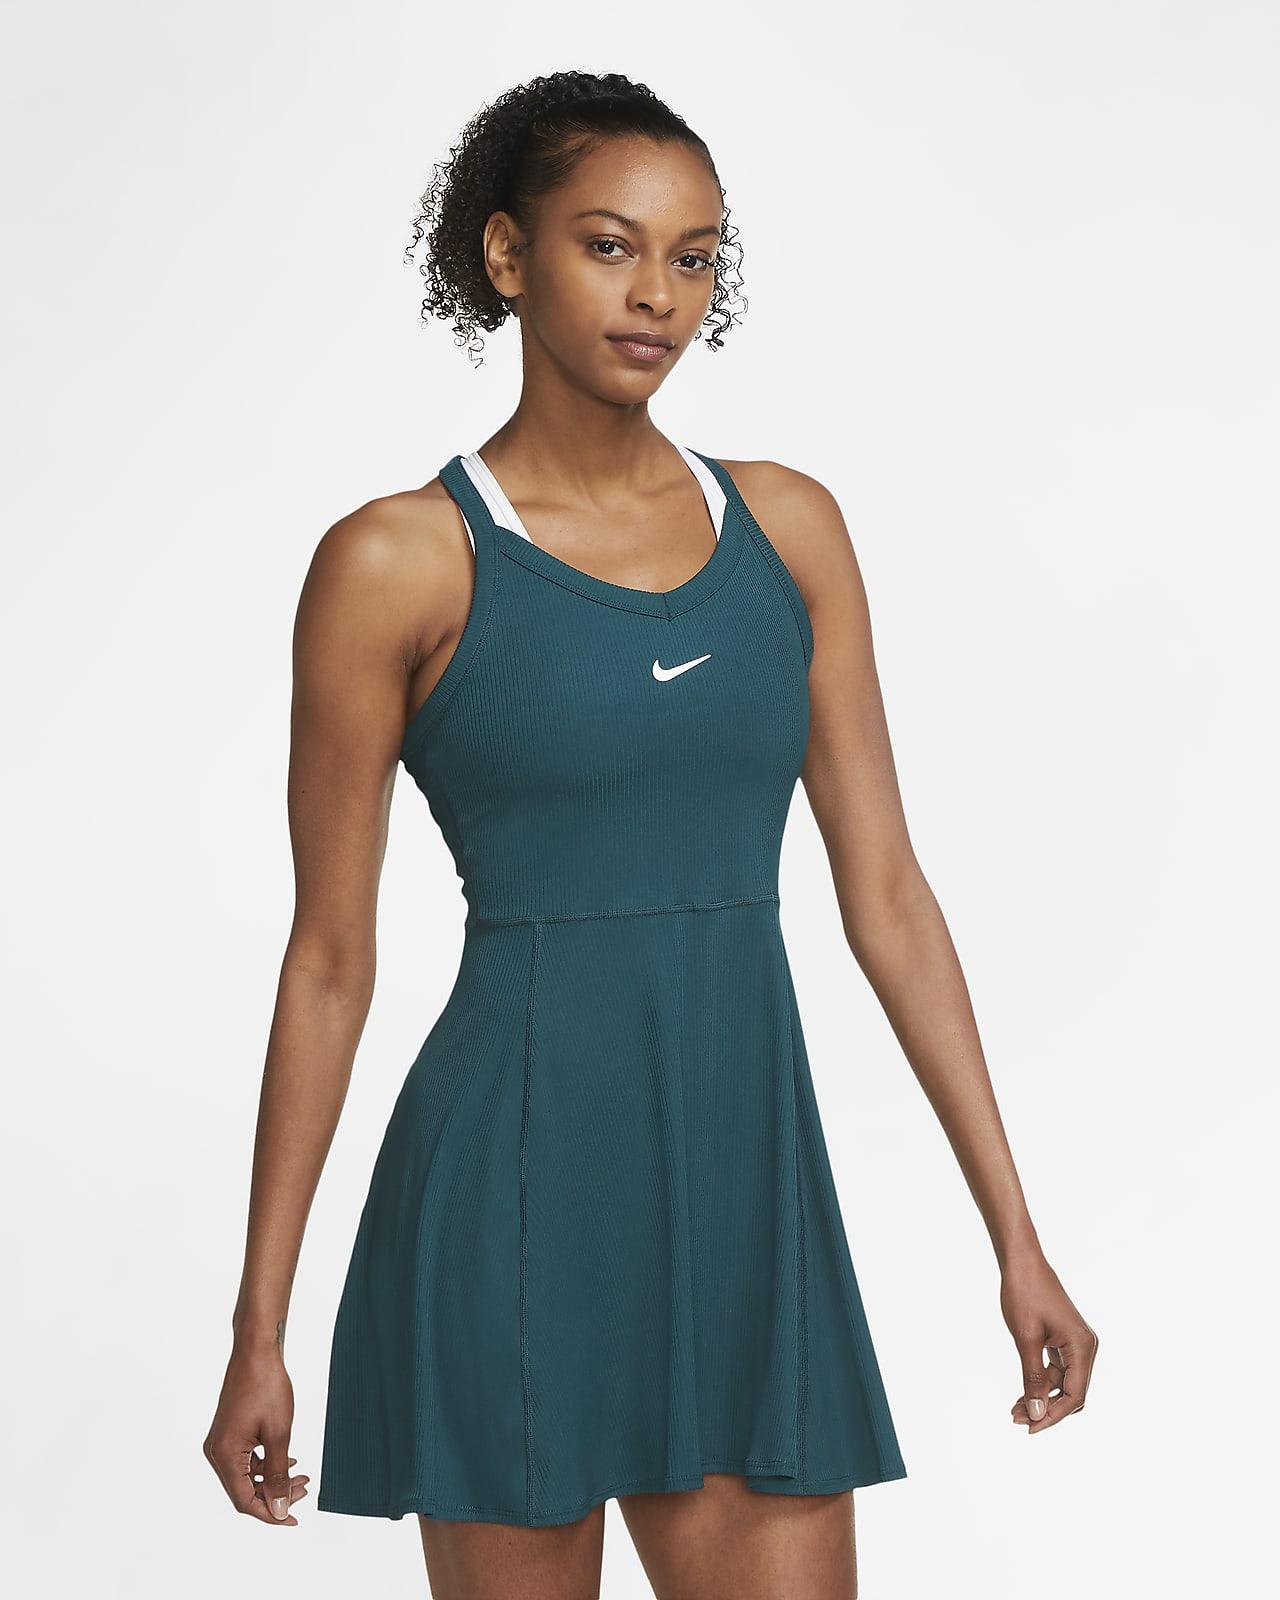 Nikecourt Dri Fit Women S Tennis Dress Nike Hu